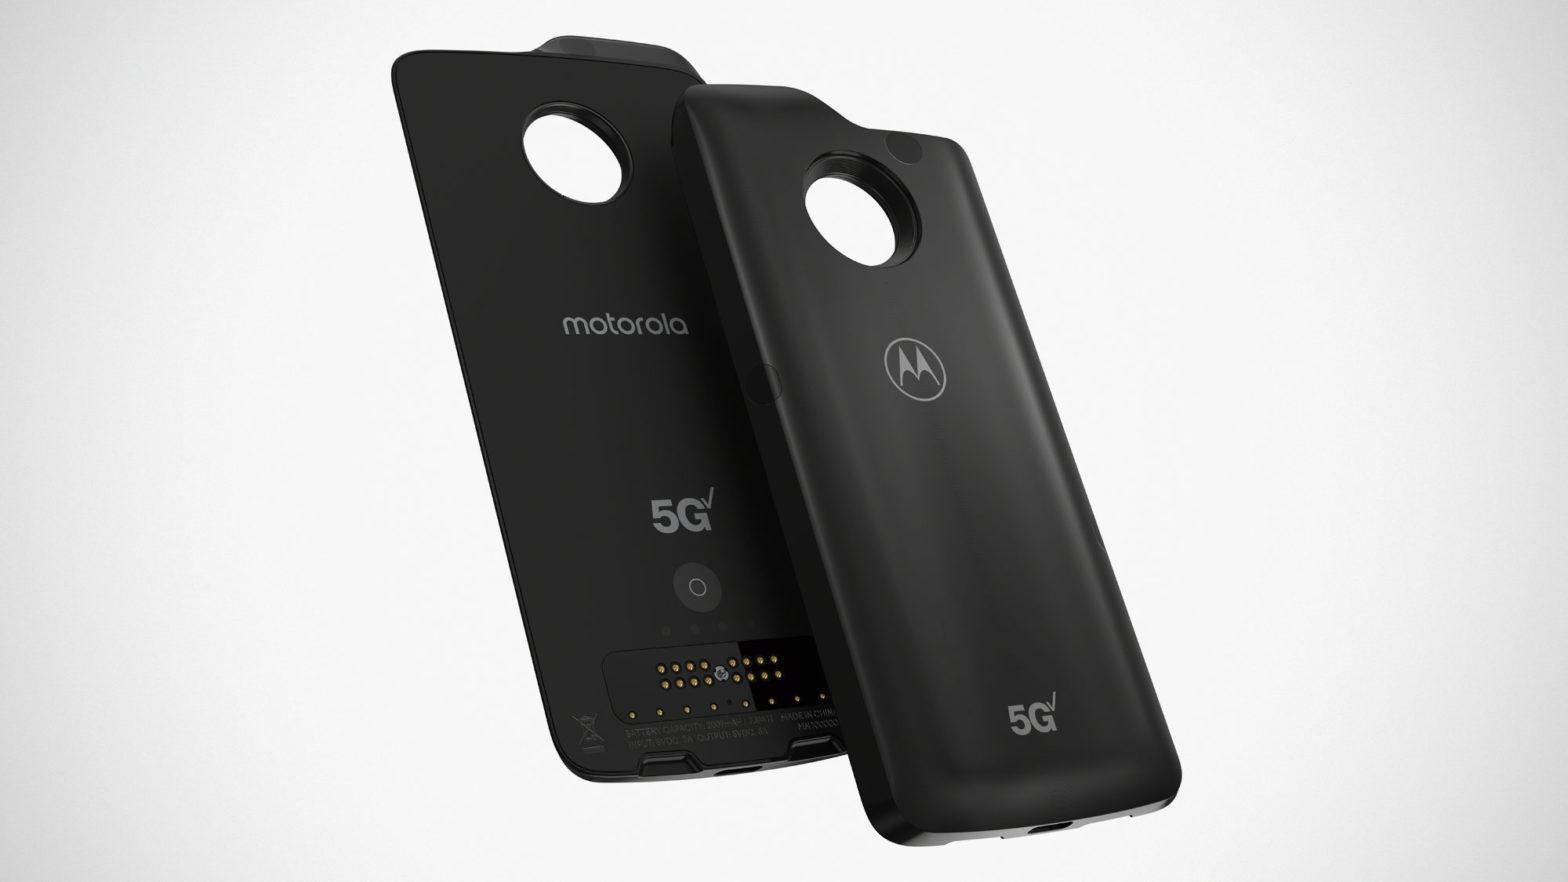 Motorola Moto Z2 Force 5G